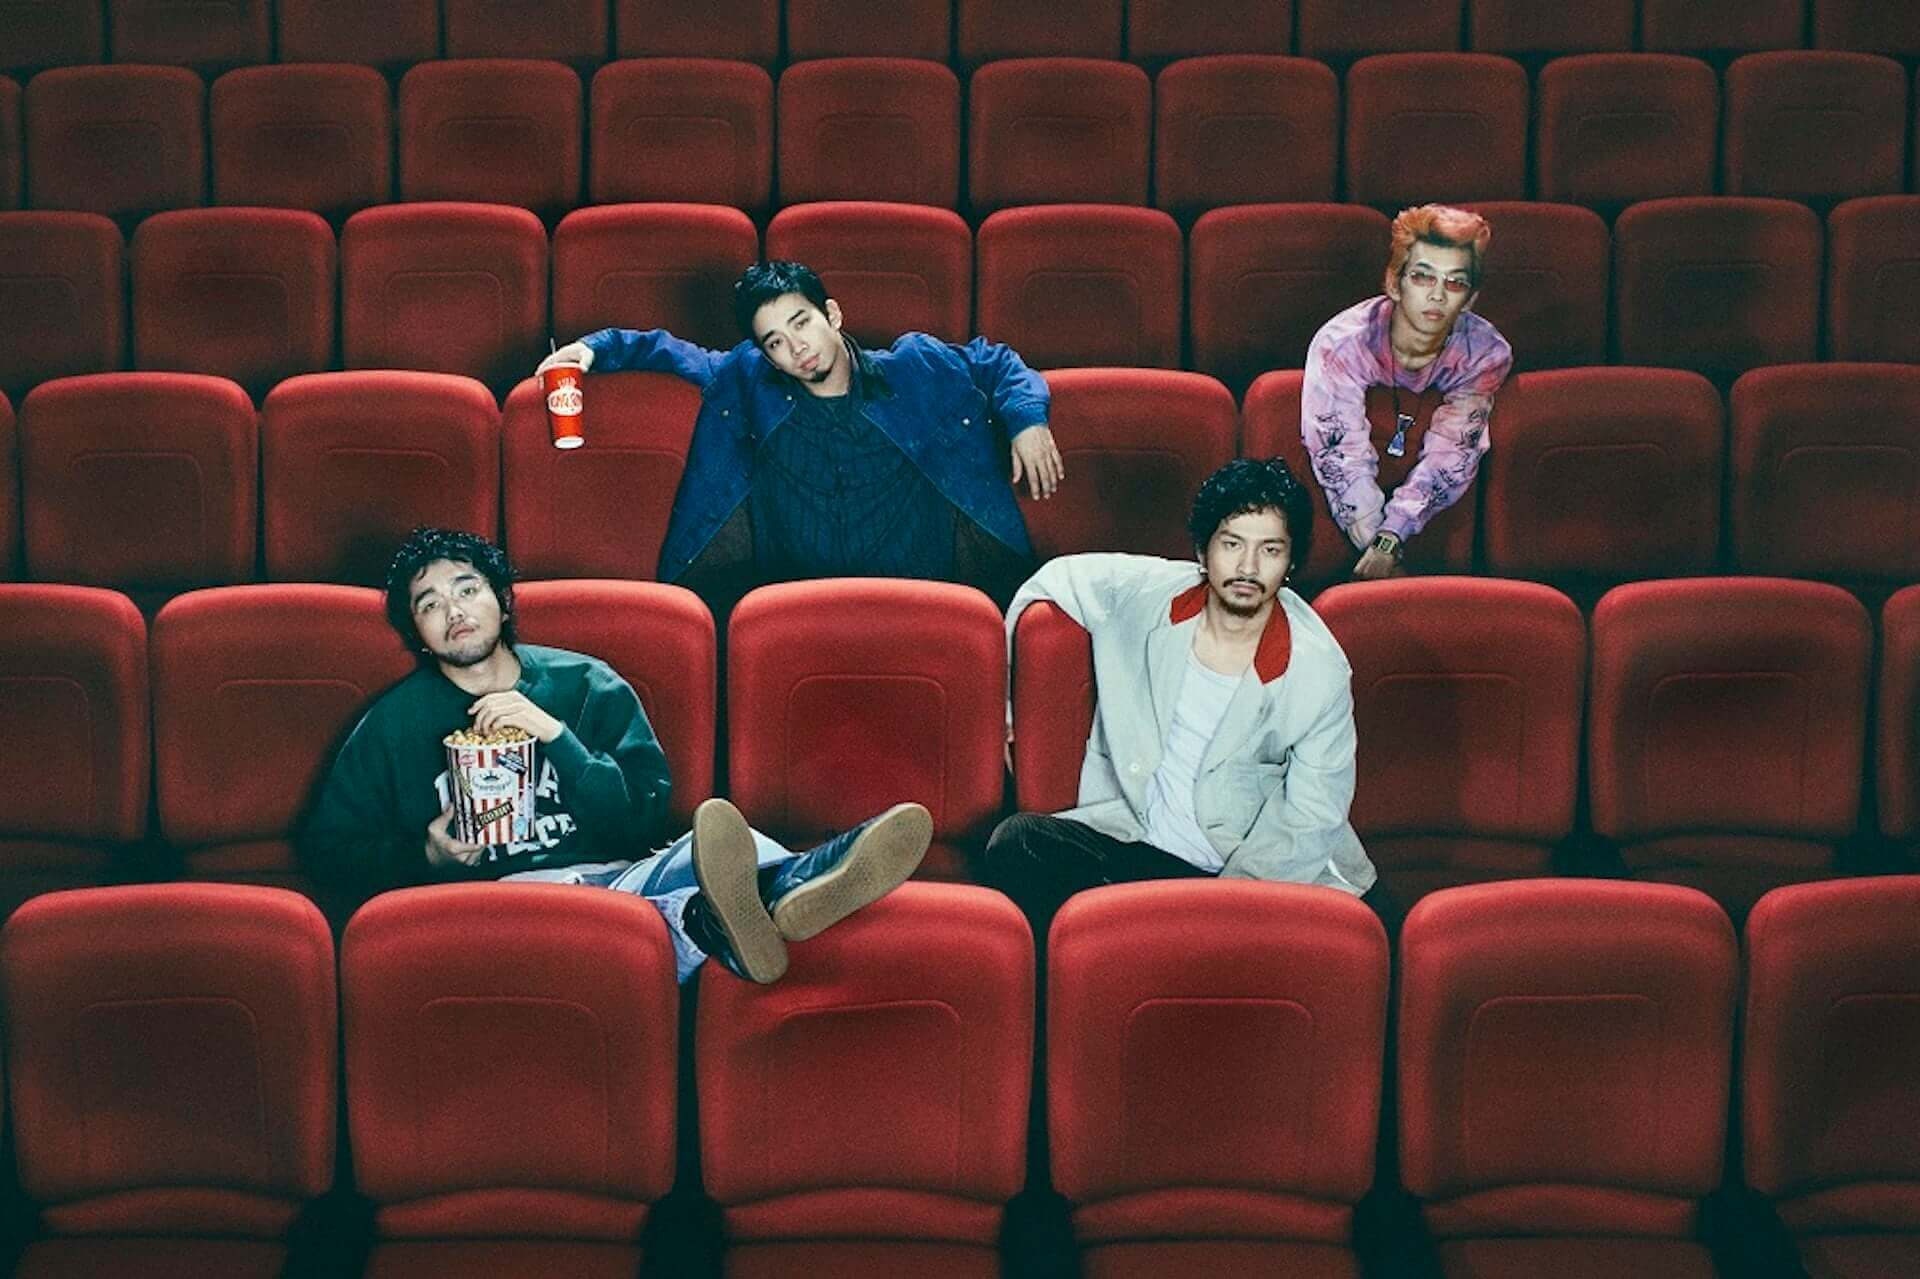 King Gnu「傘」「The hole」を地上波初披露!来週『Love music』特別番組放送決定 music200203_kinggnu_7